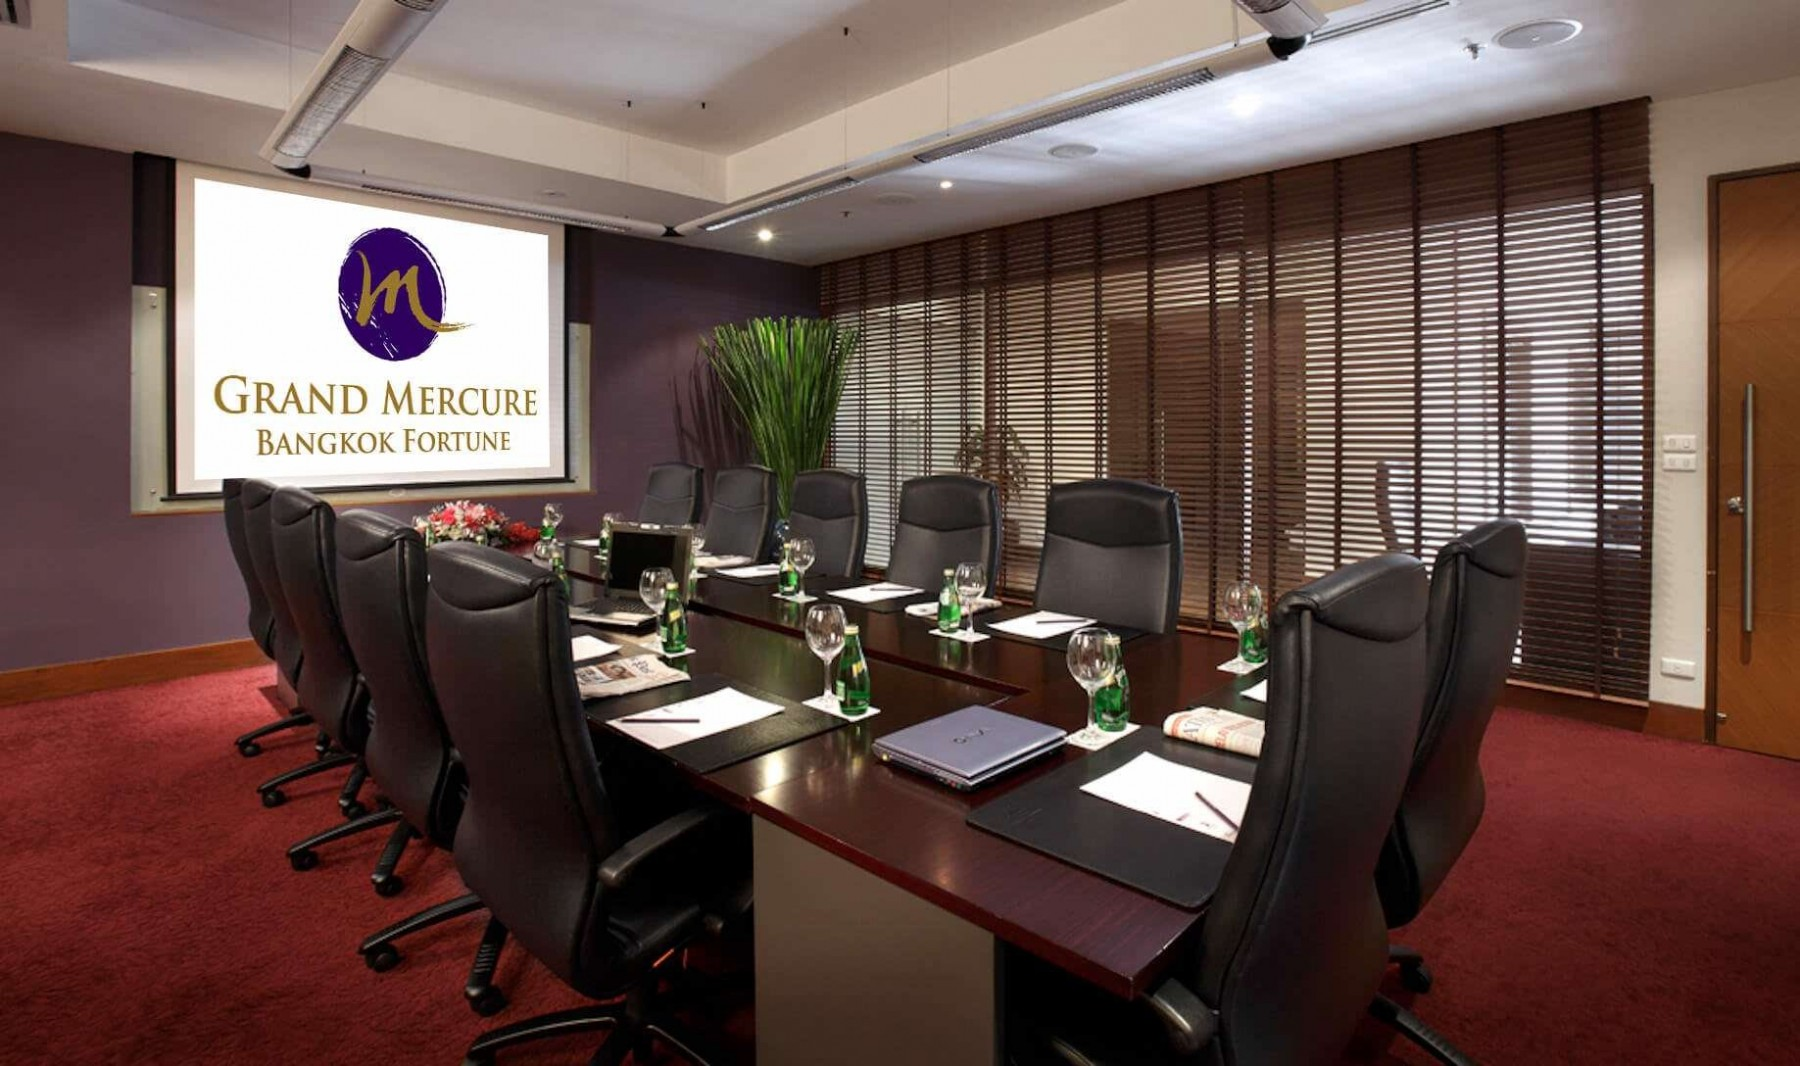 Grand Mercure Bangkok Fortune Conference Room